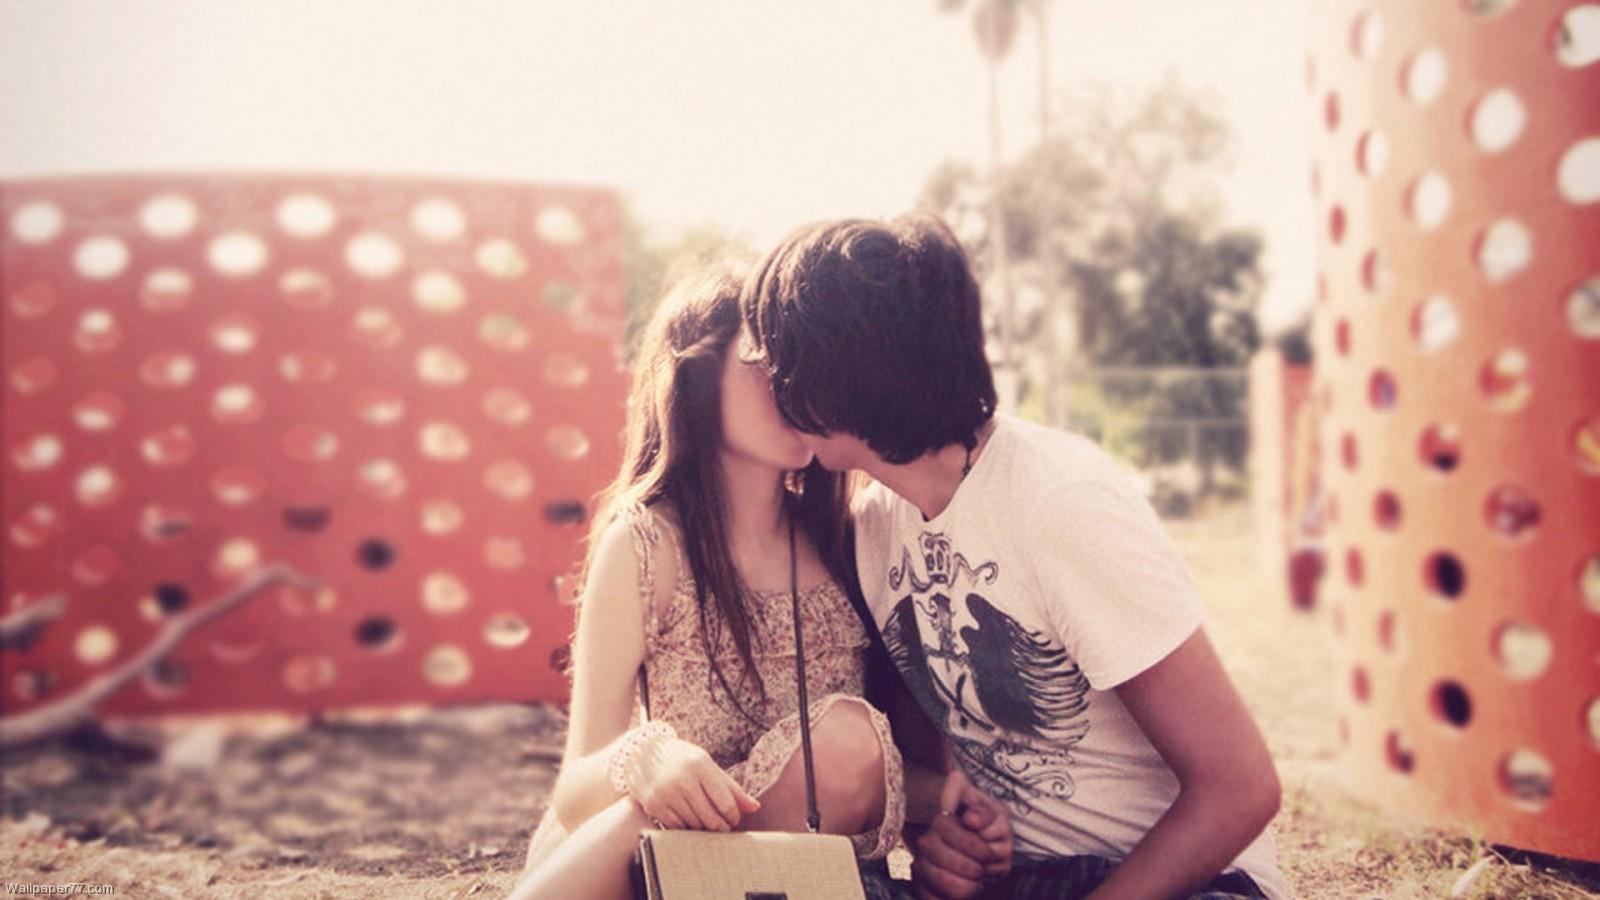 Love at first sight. Summer romance.